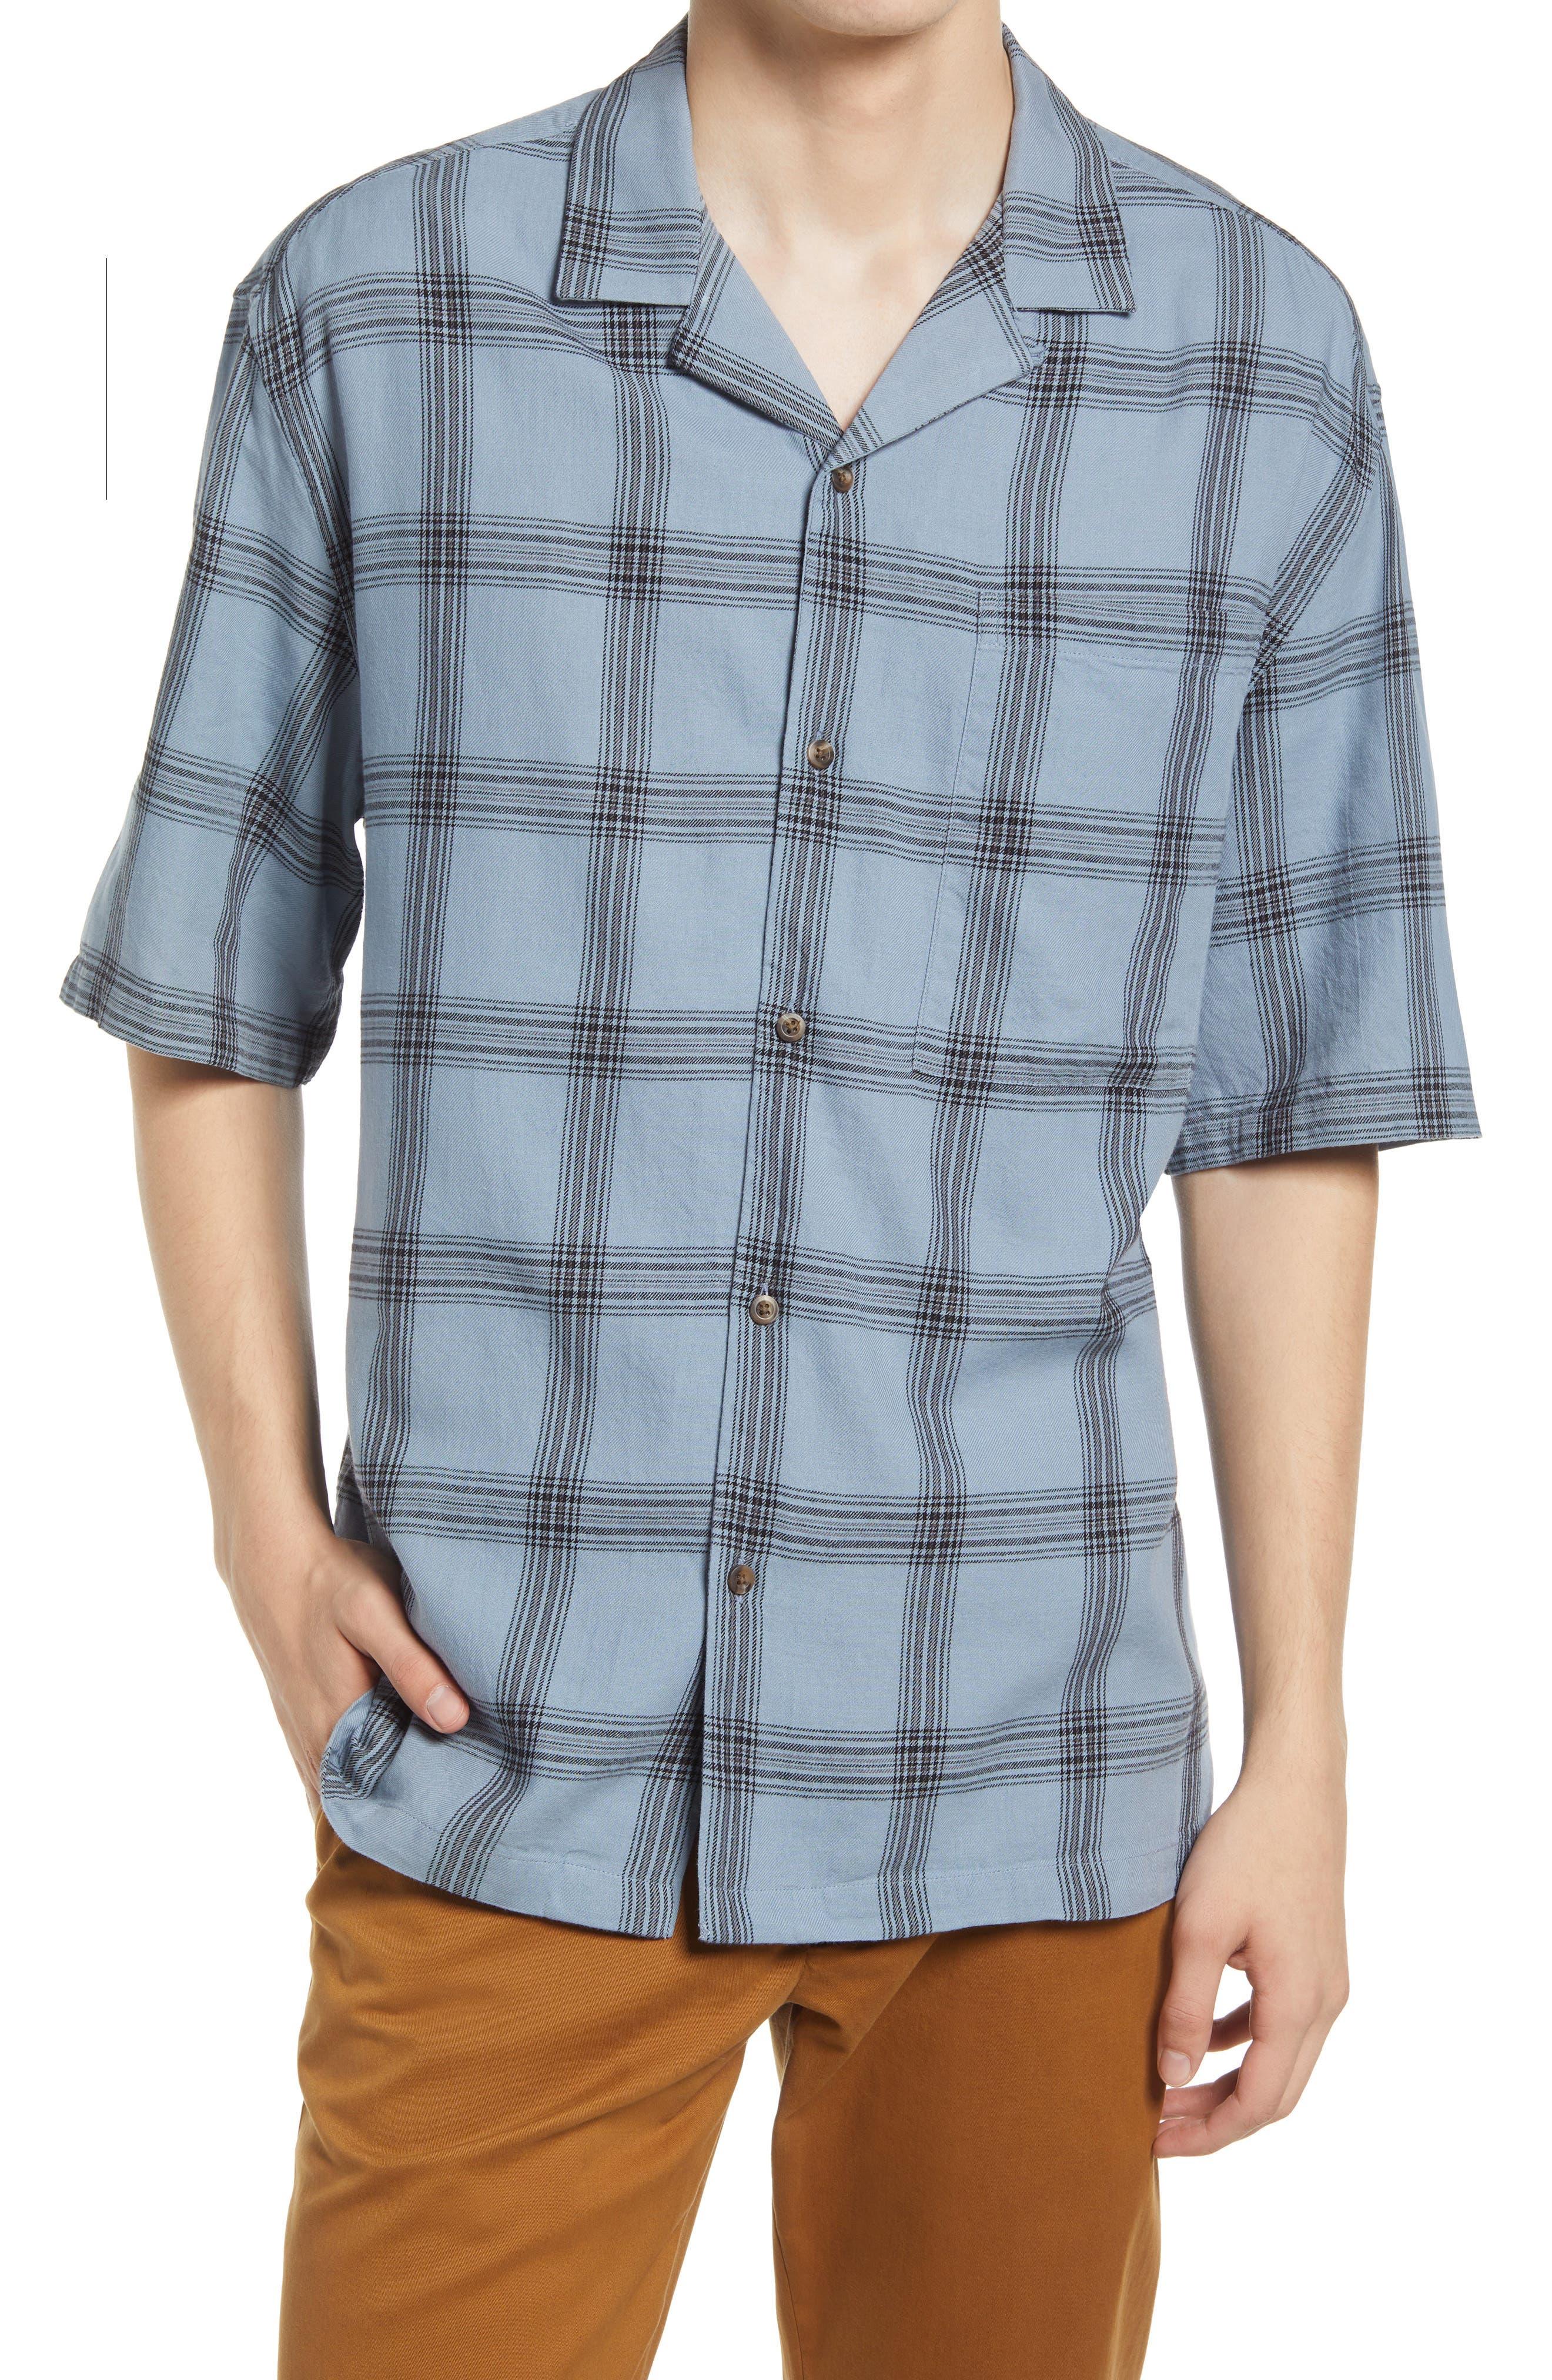 1950s Mens Shirts   Retro Bowling Shirts, Vintage Hawaiian Shirts Mens Topman Boxy Check Short Sleeve Button-Up Camp Shirt Size Medium - Blue $45.00 AT vintagedancer.com